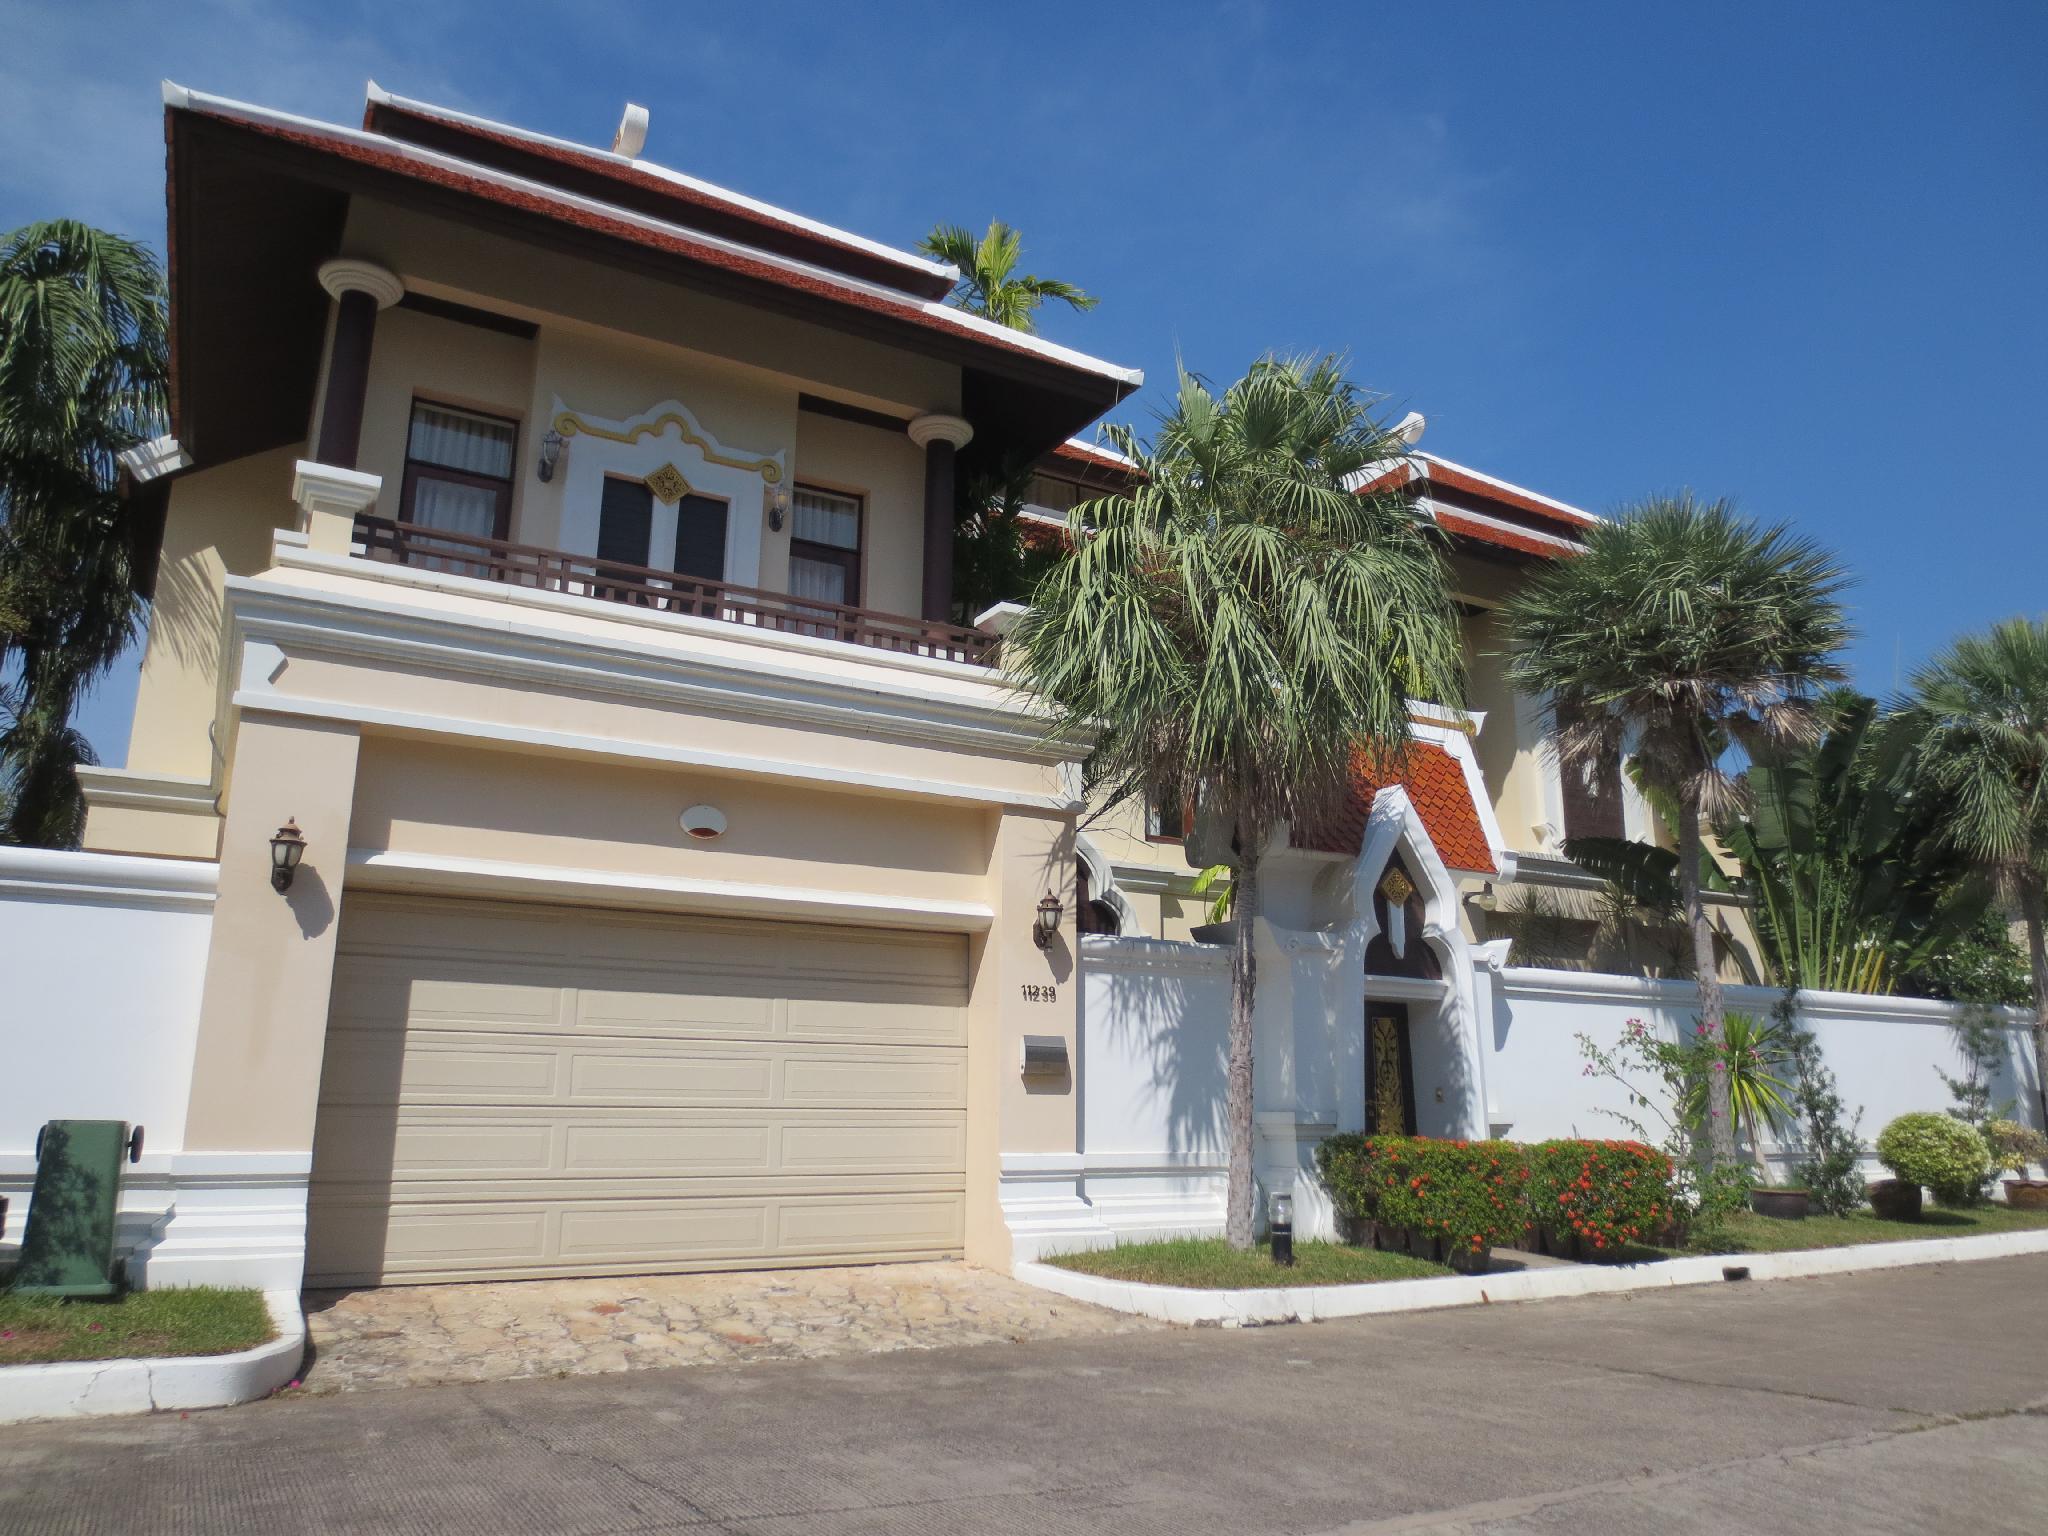 Pattaya Pool Villa & Luxury Home/Viewtalay Marina วิลลา 3 ห้องนอน 4 ห้องน้ำส่วนตัว ขนาด 550 ตร.ม. – นาจอมเทียน